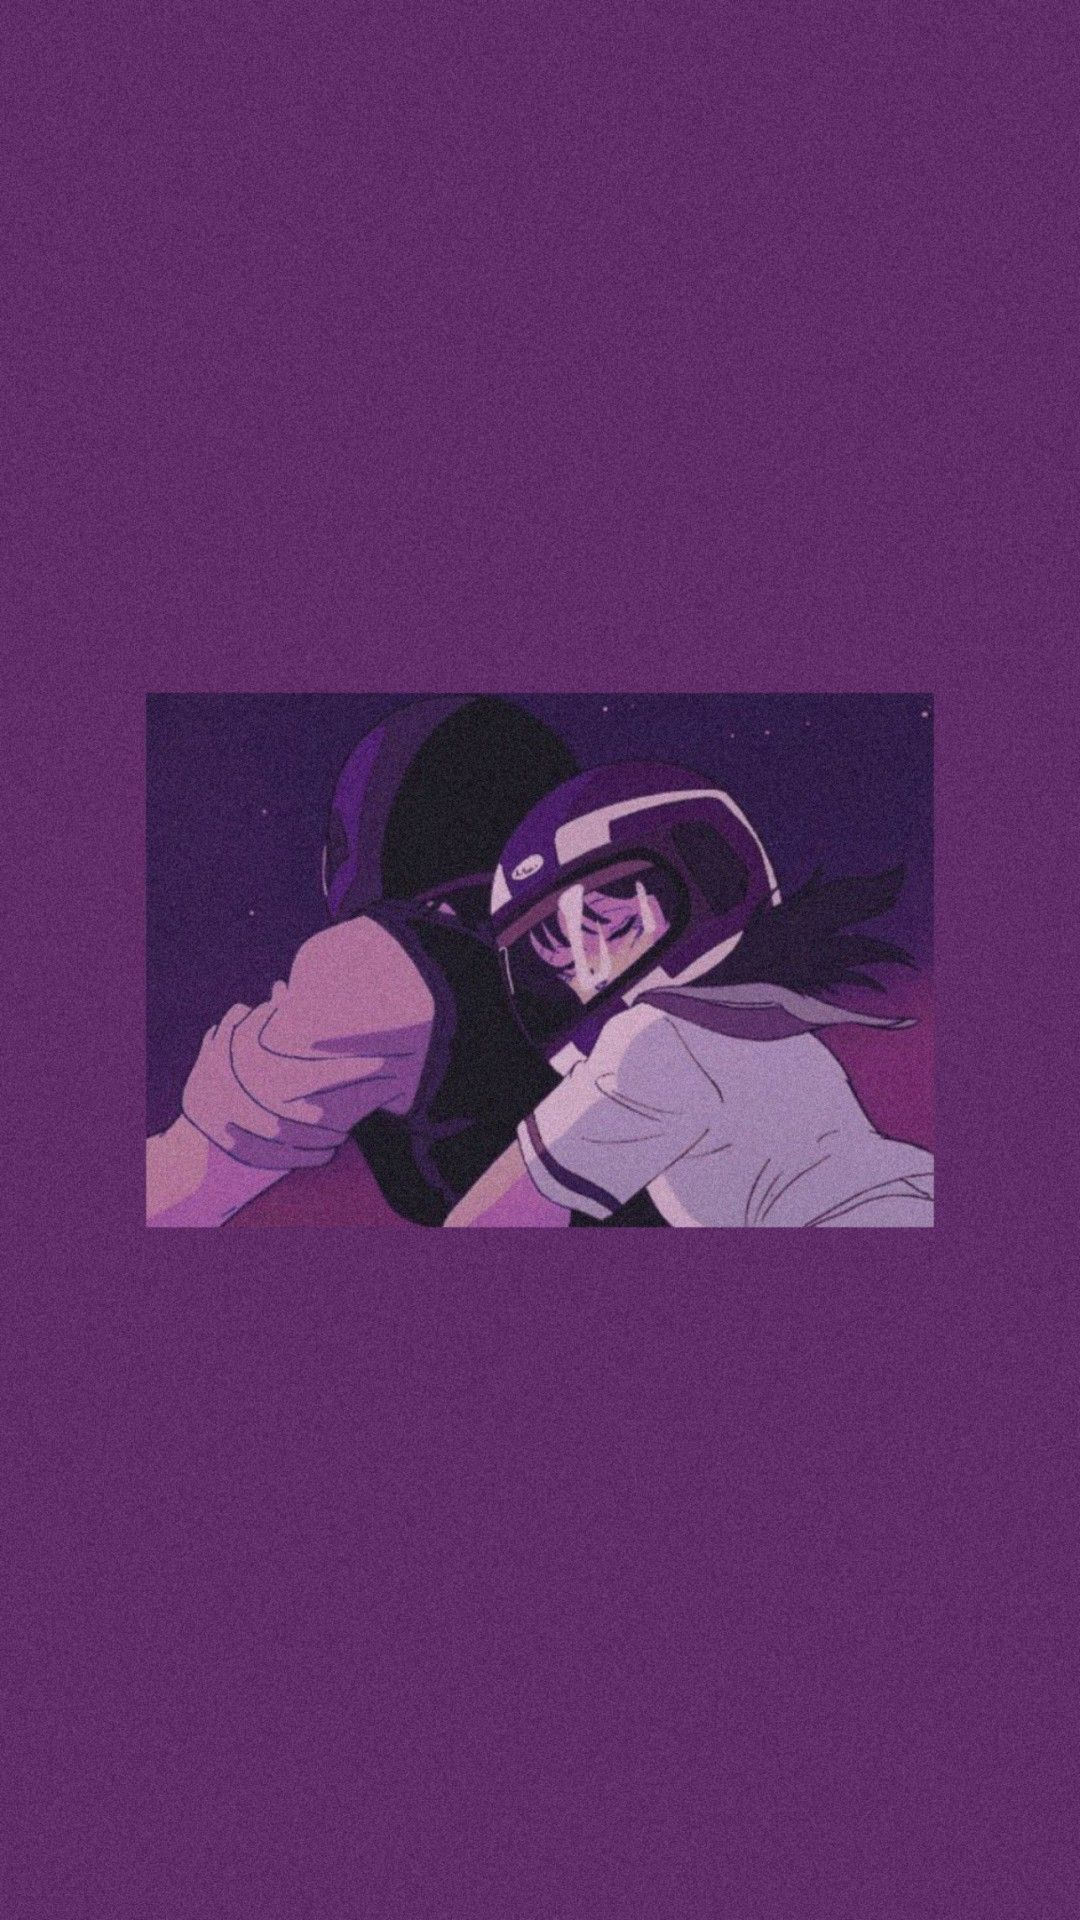 Messy Lockscreens Studio Ghibli Minimalistic Lockscreens Please Cute Anime Wallpaper Anime Scenery Wallpaper Anime Wallpaper Cute anime wallpaper dark purple anime